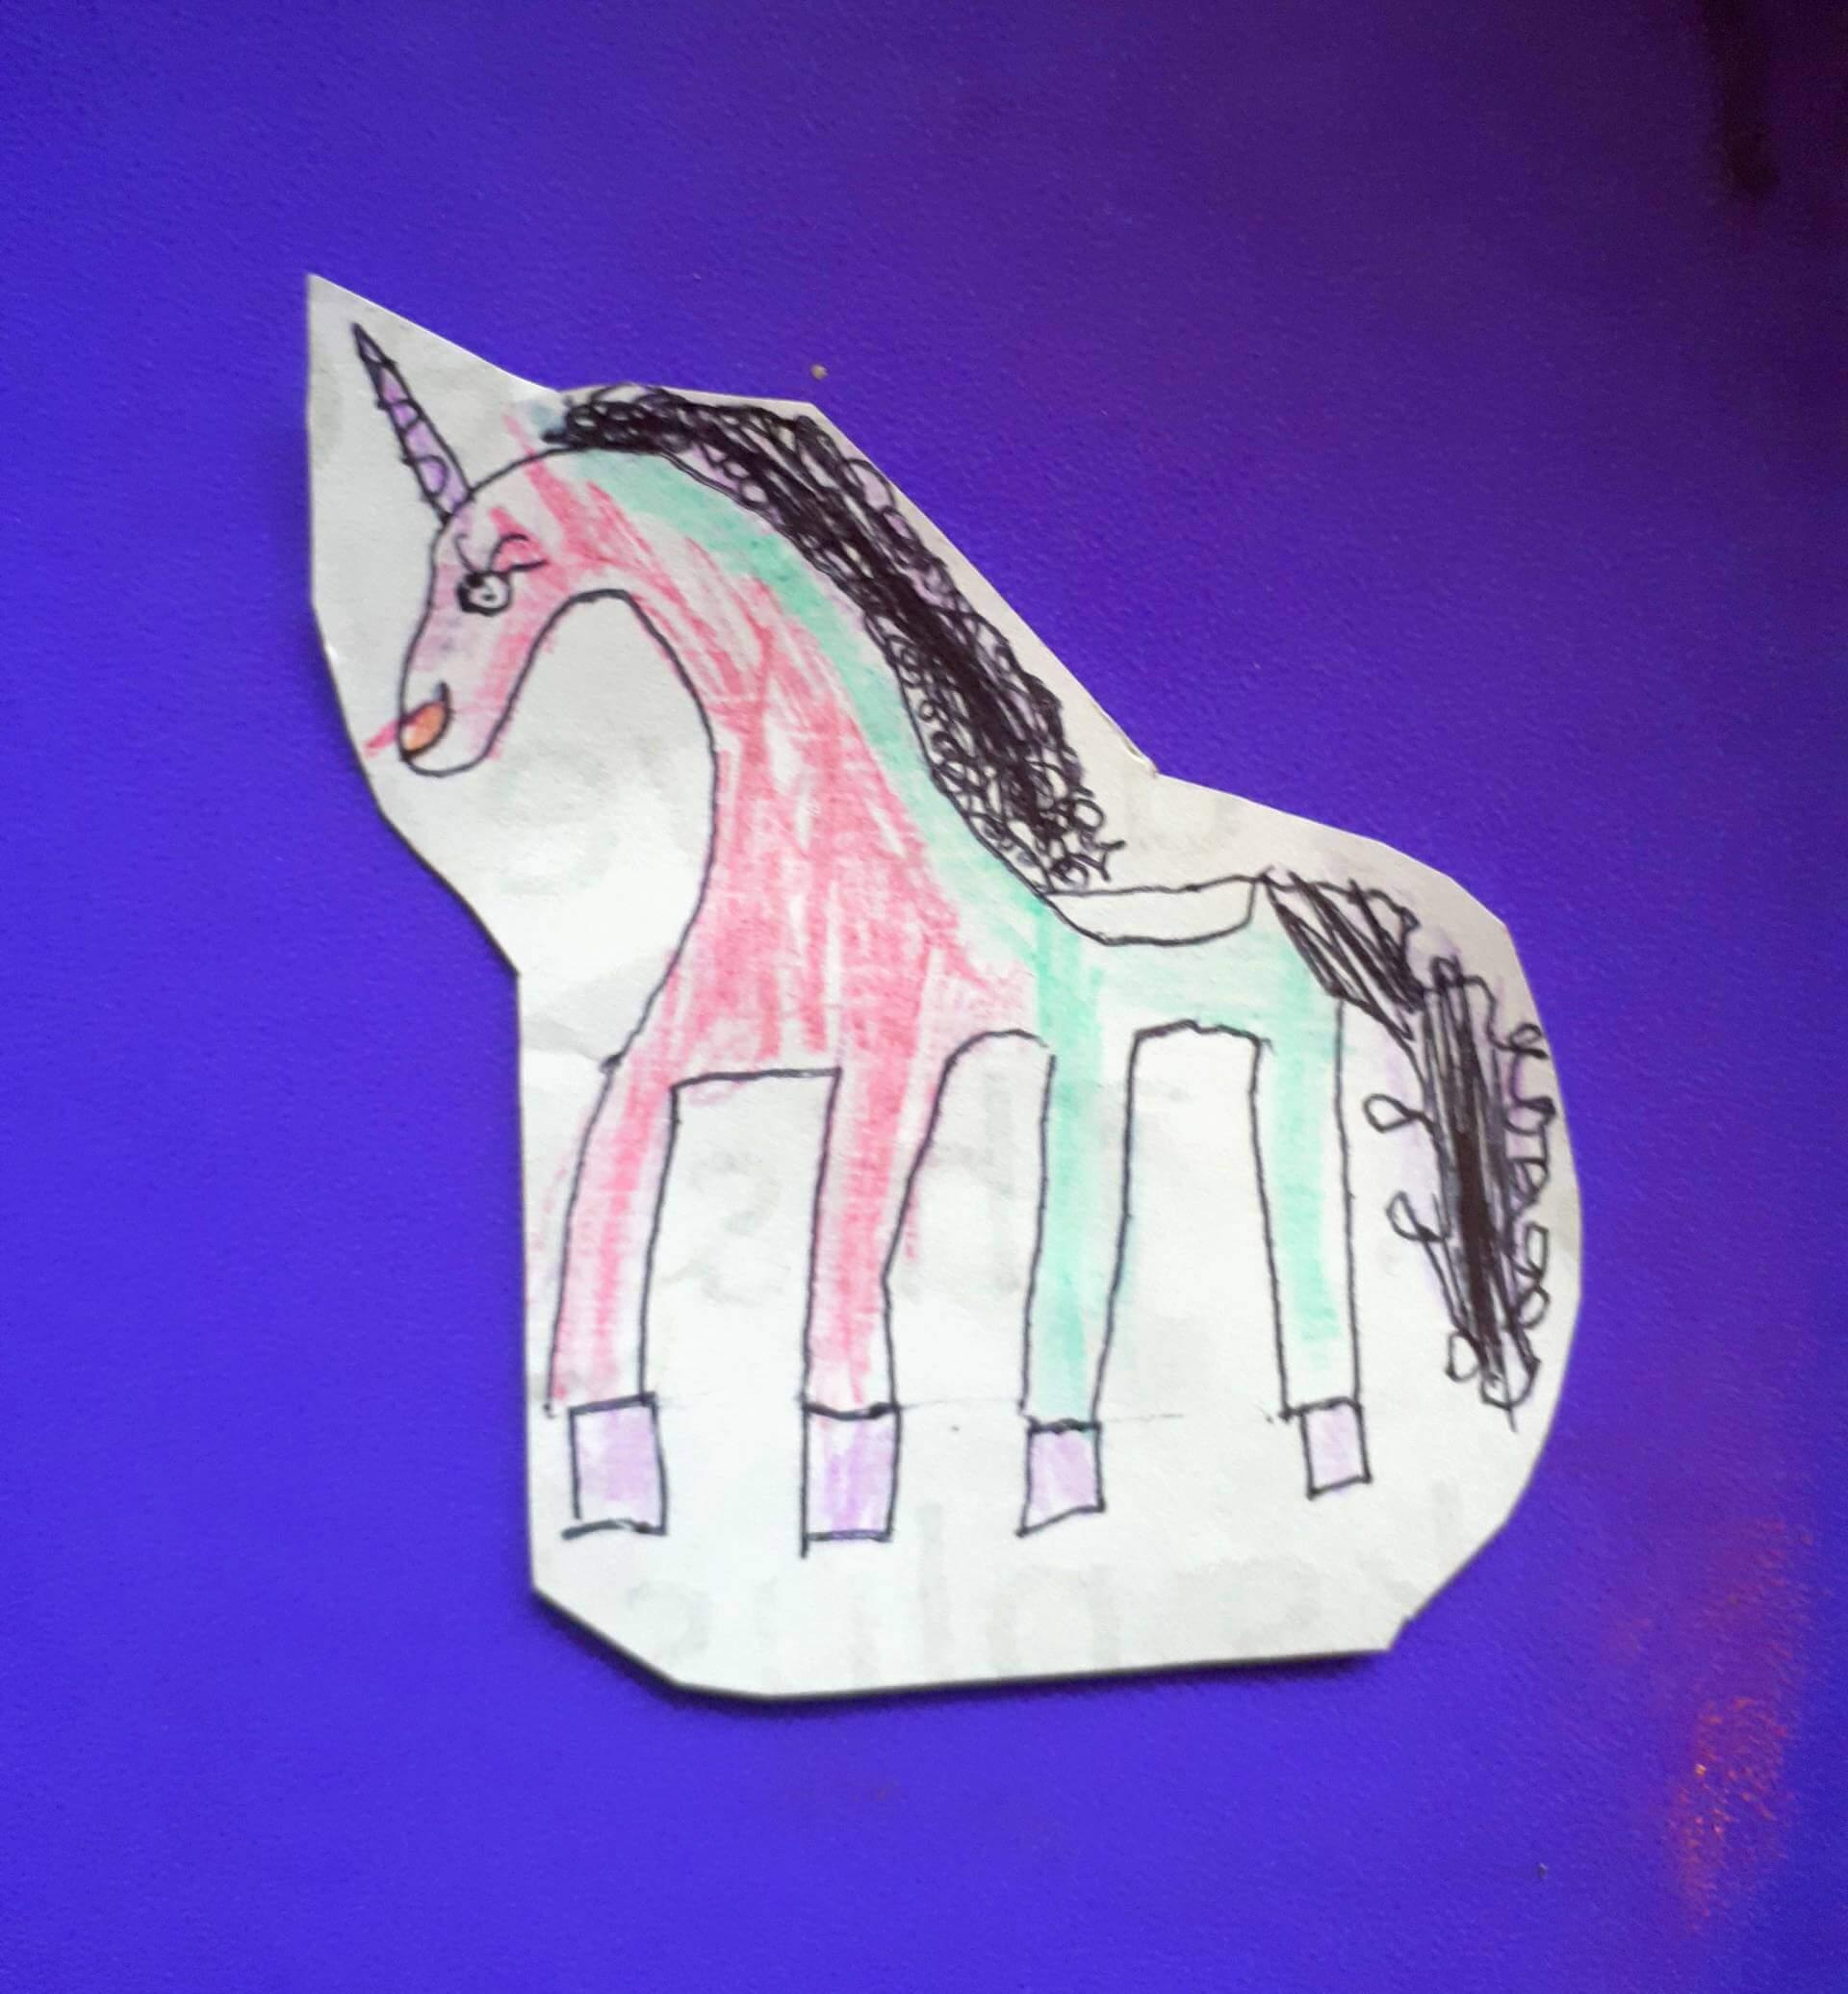 hand-drawn-horse-dream-horse-petplan-equine-insurance-midwifeandlife.com